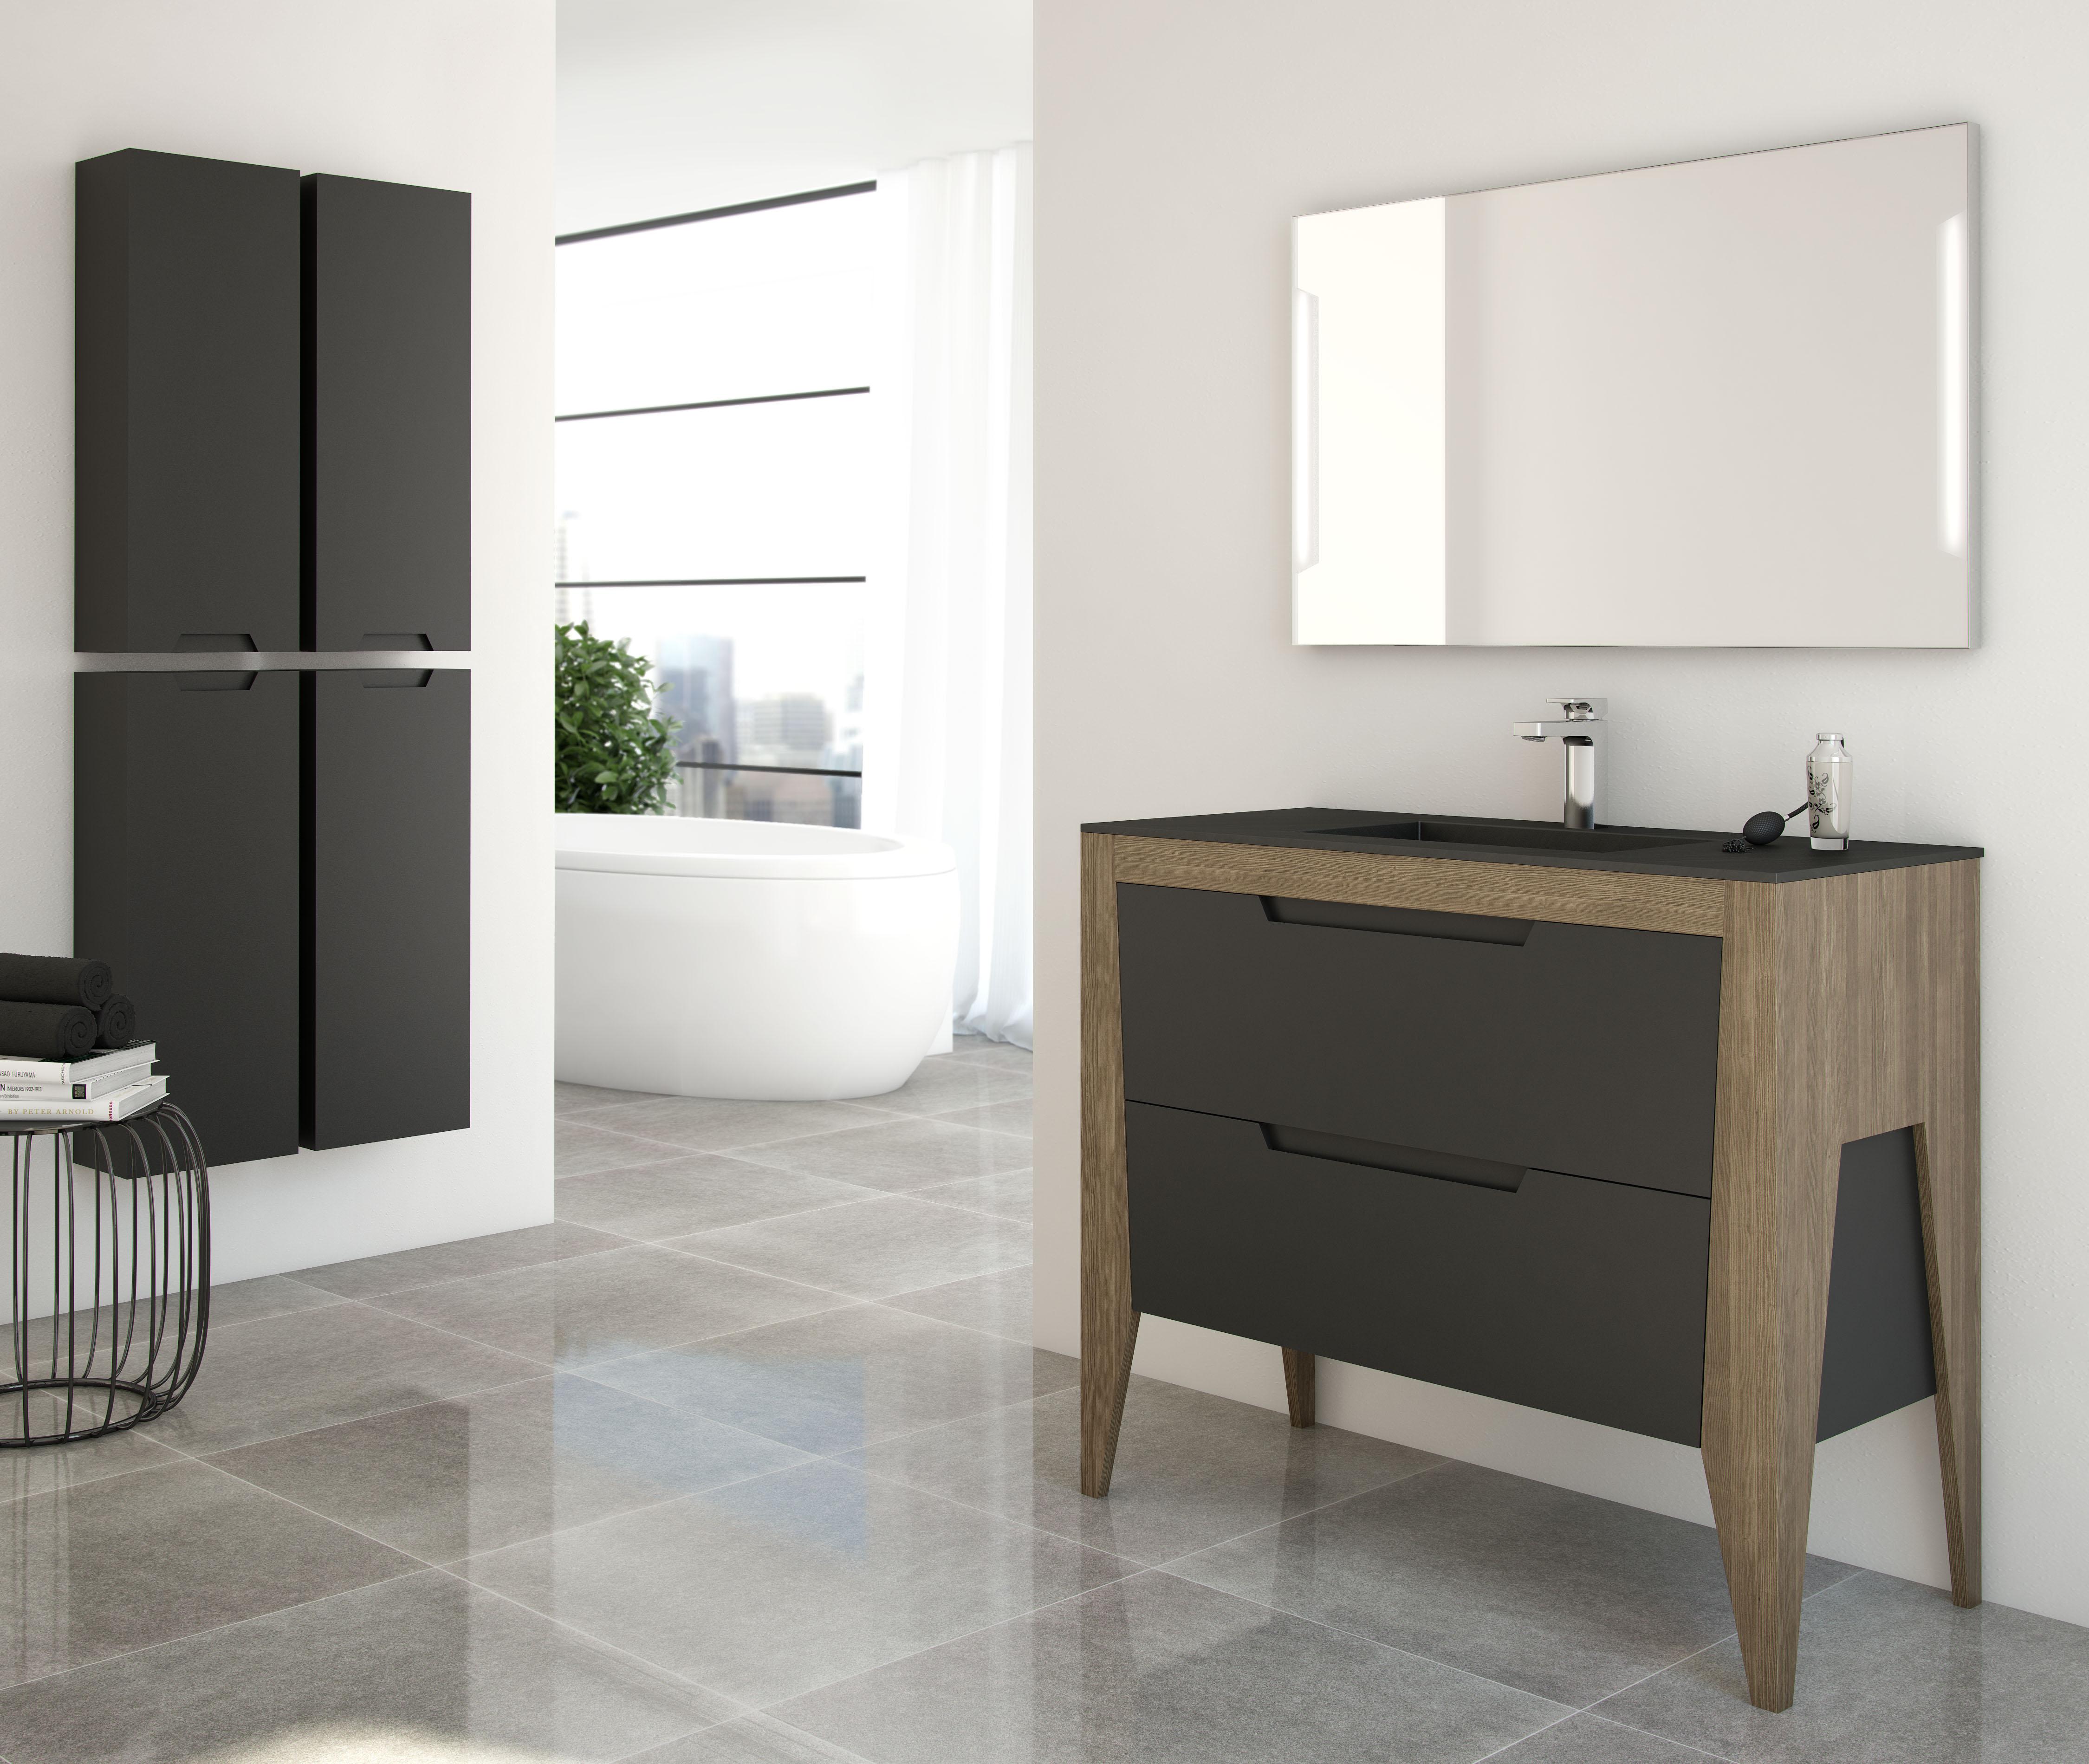 Deko provisional ikebe fabrica de muebles de ba o a - Muebles de lavabo a medida ...